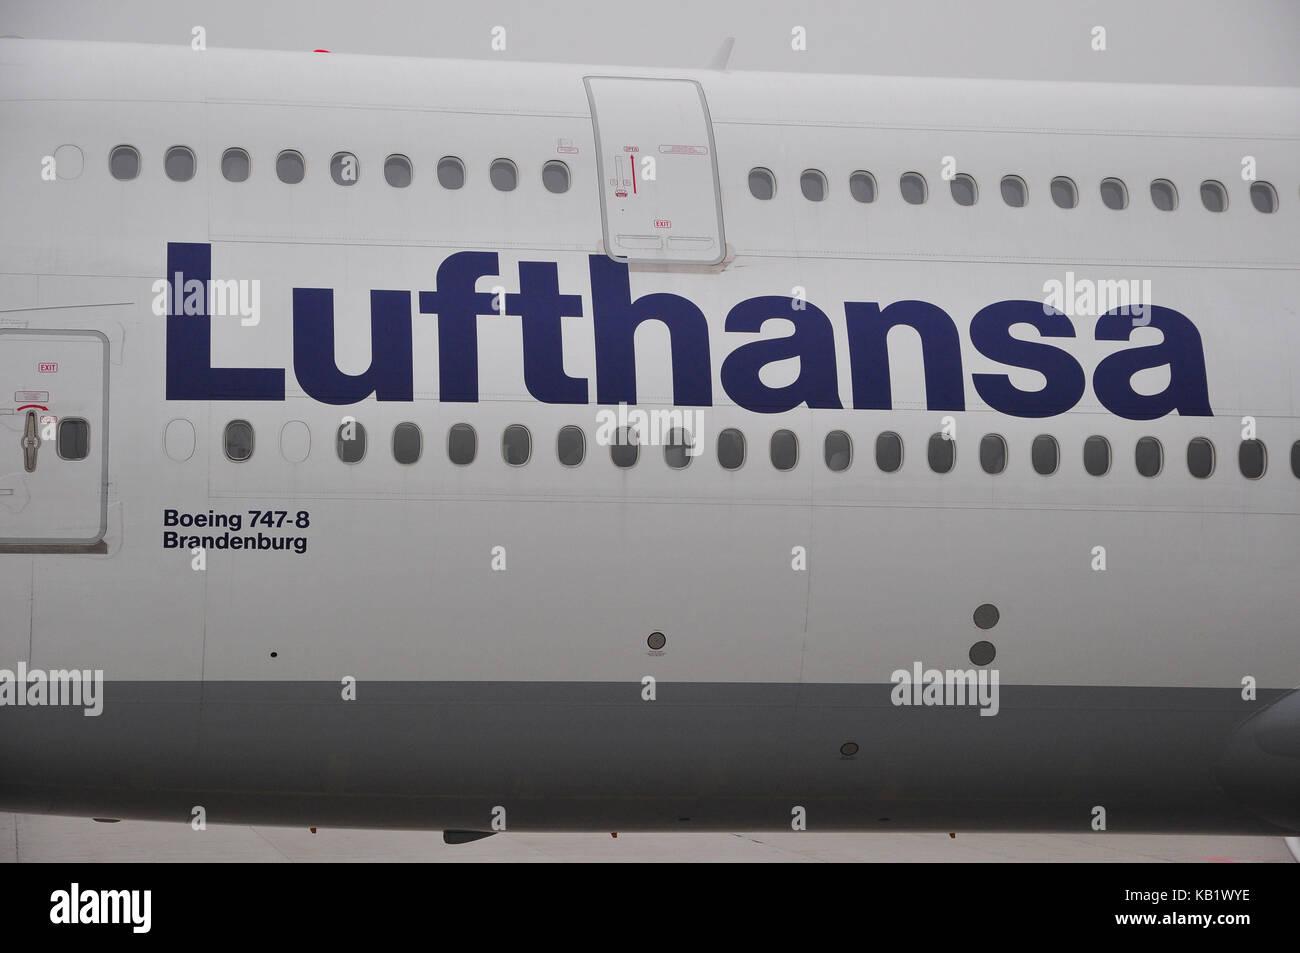 Civil aviation, air liner, body, type name, - Stock Image